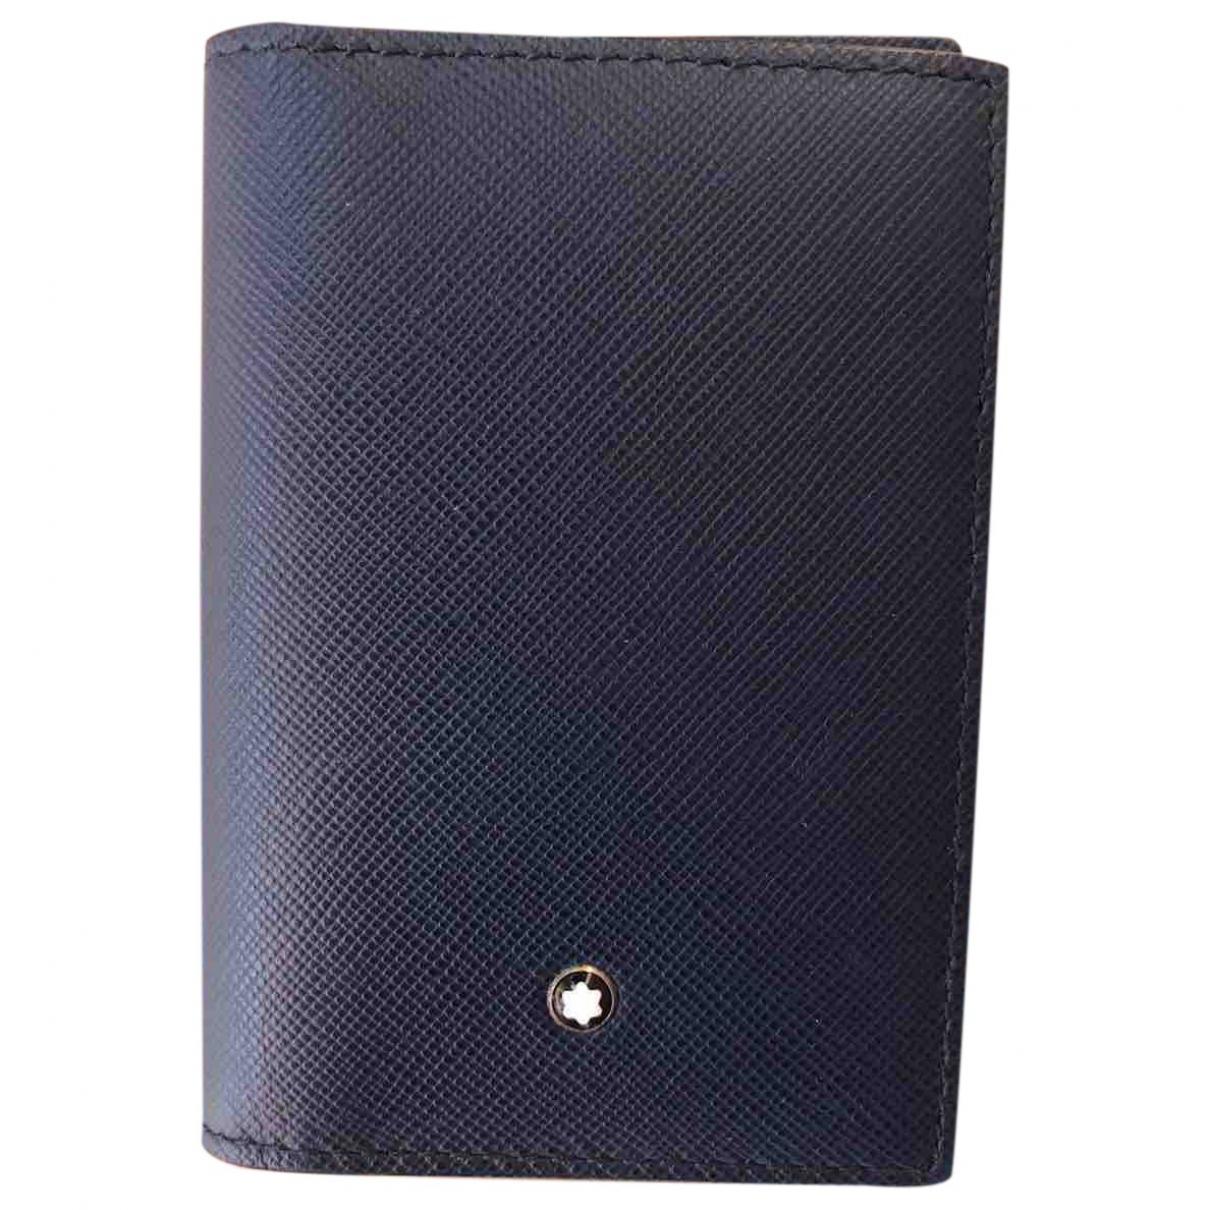 Montblanc \N Portemonnaie in  Blau Leder